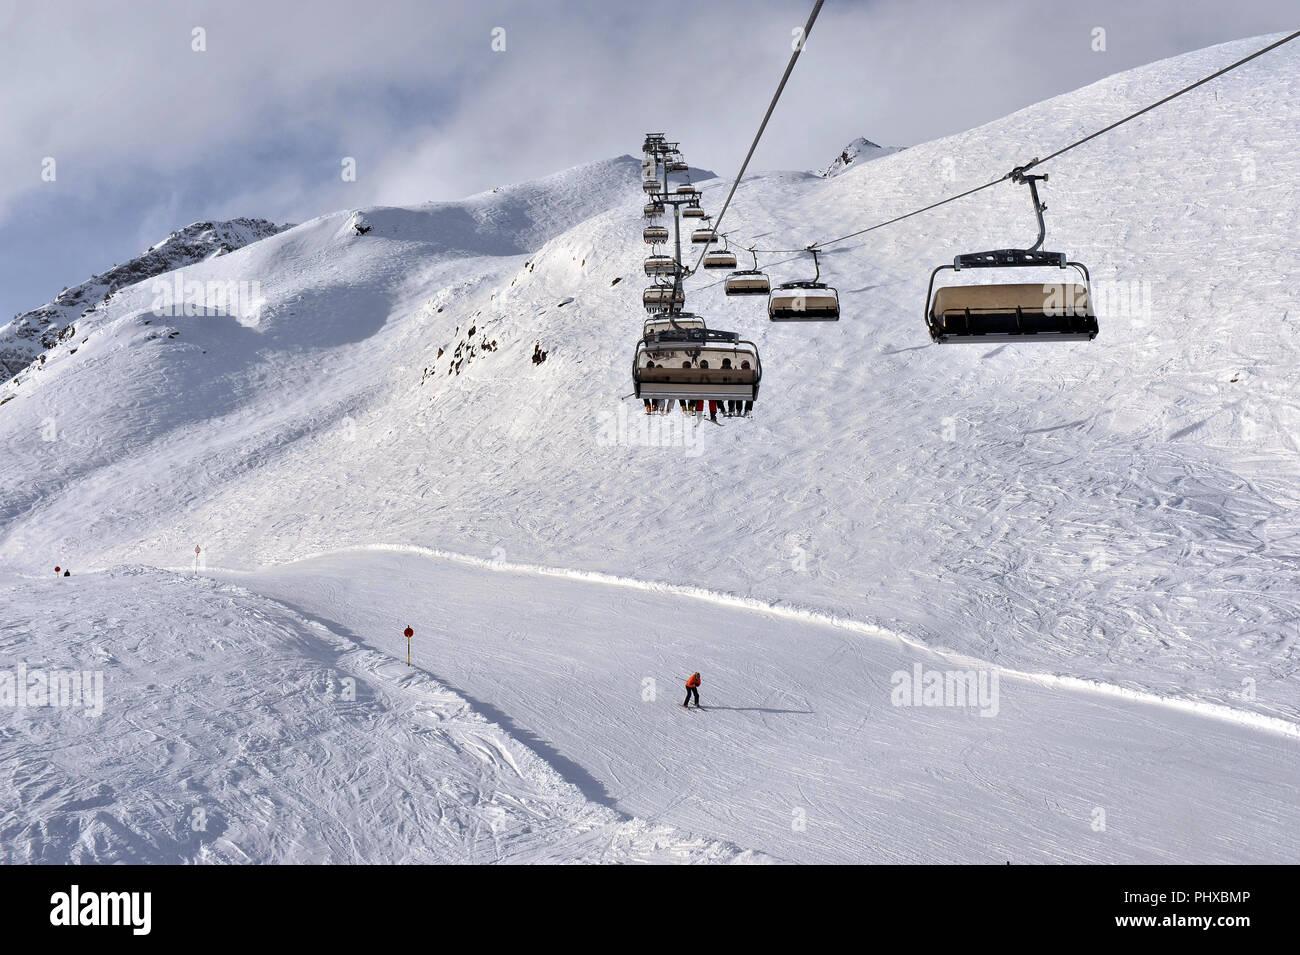 buy ski lift chair plastic adirondack chairs australia on bright winter day stock photo 217553526 alamy